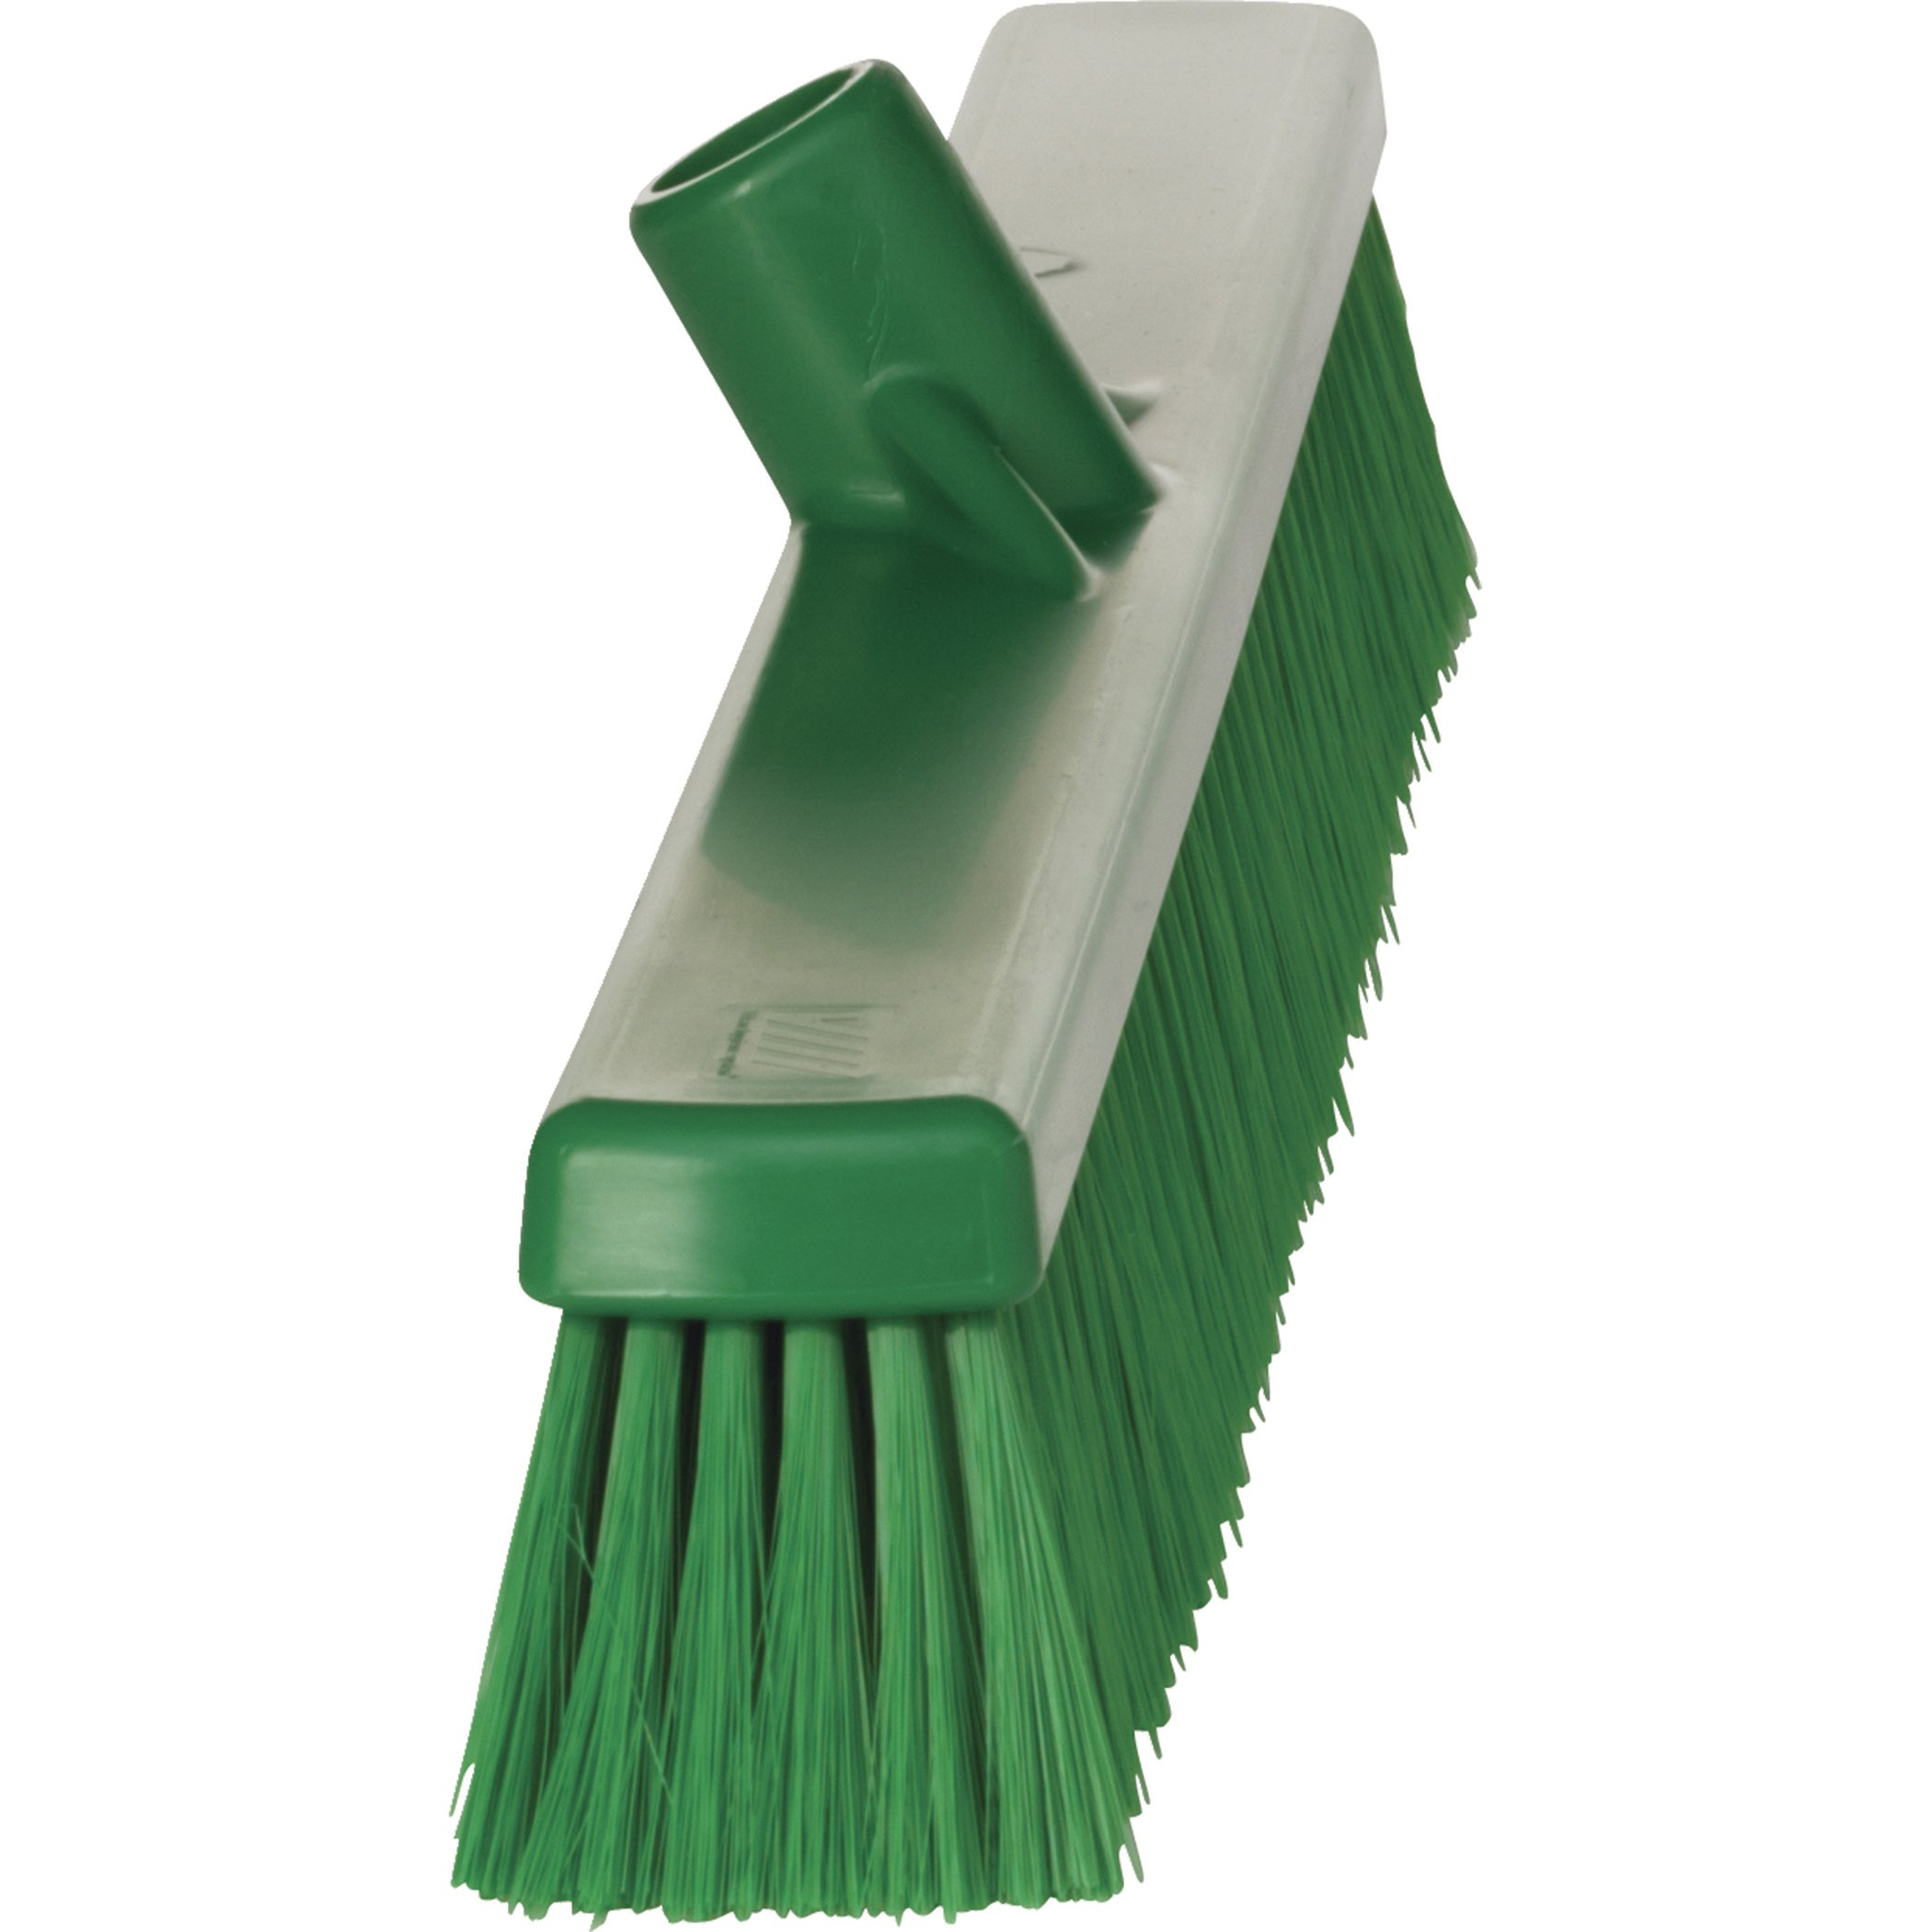 Vikan 31992 Fine Sweep Floor Broom Head, Polypropylene Block, 23-1/2'' Polyester Bristle, Green by Vikan